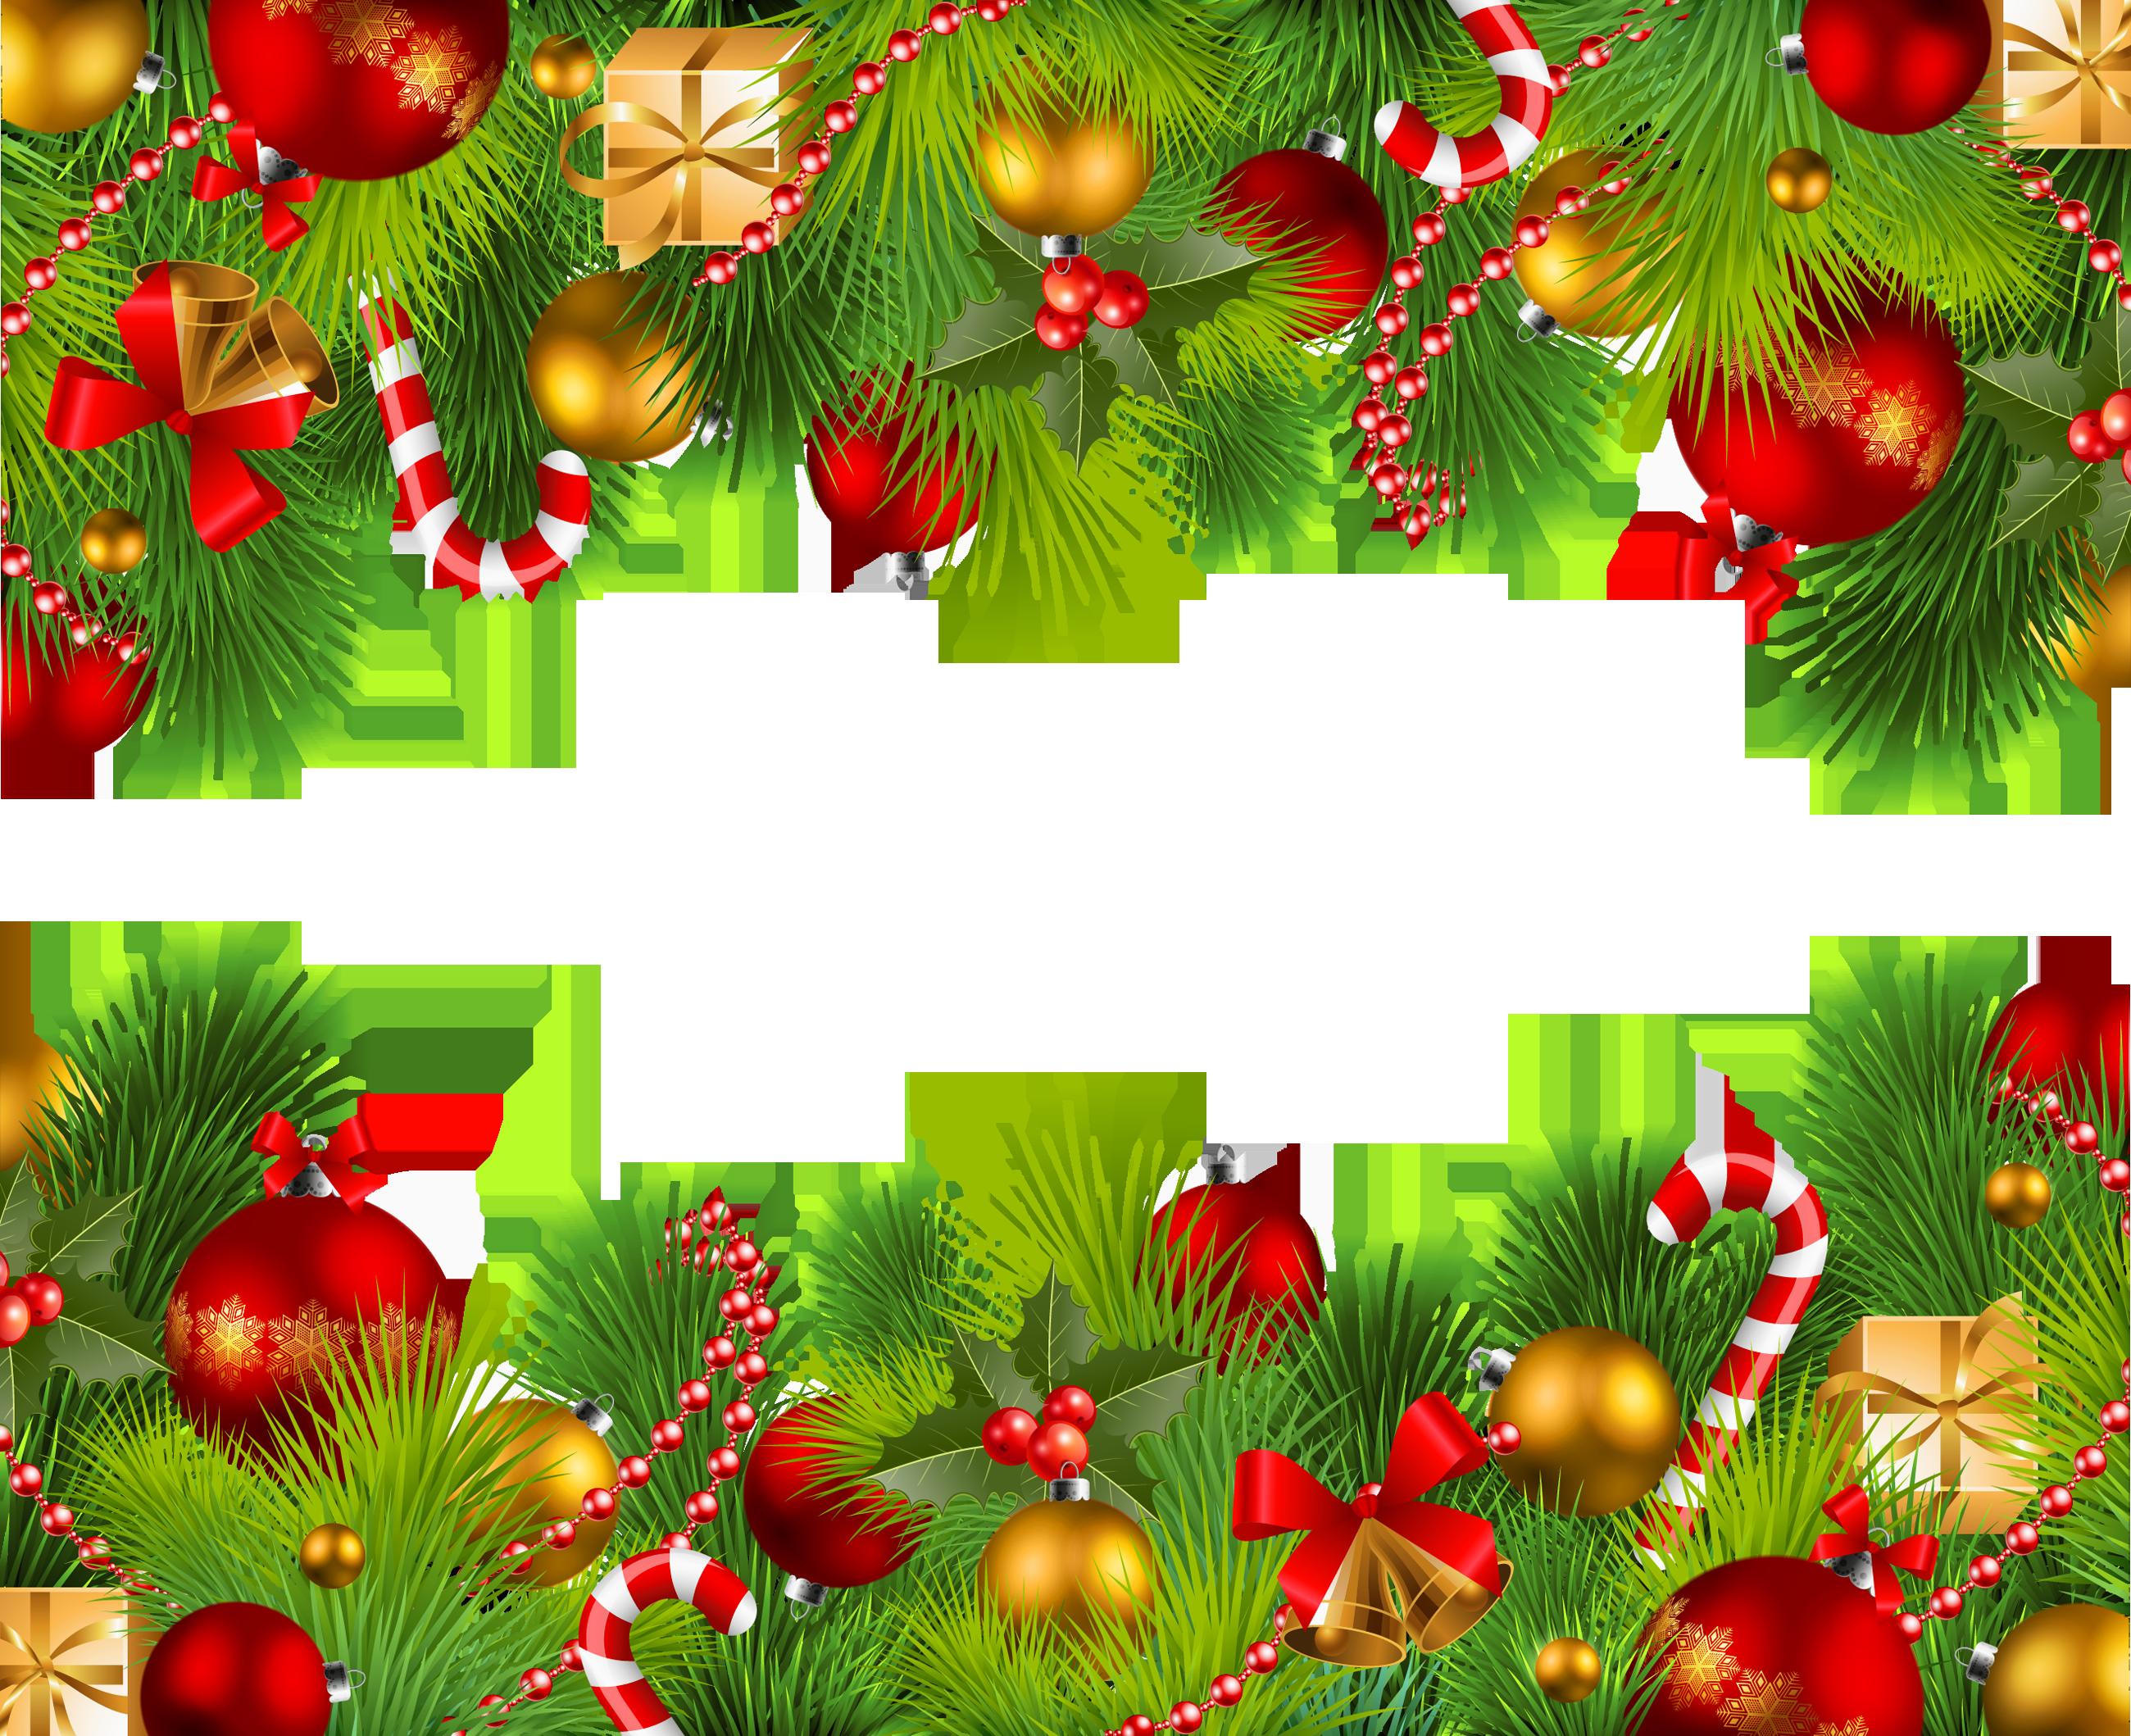 Images download image. Christmas card frame png